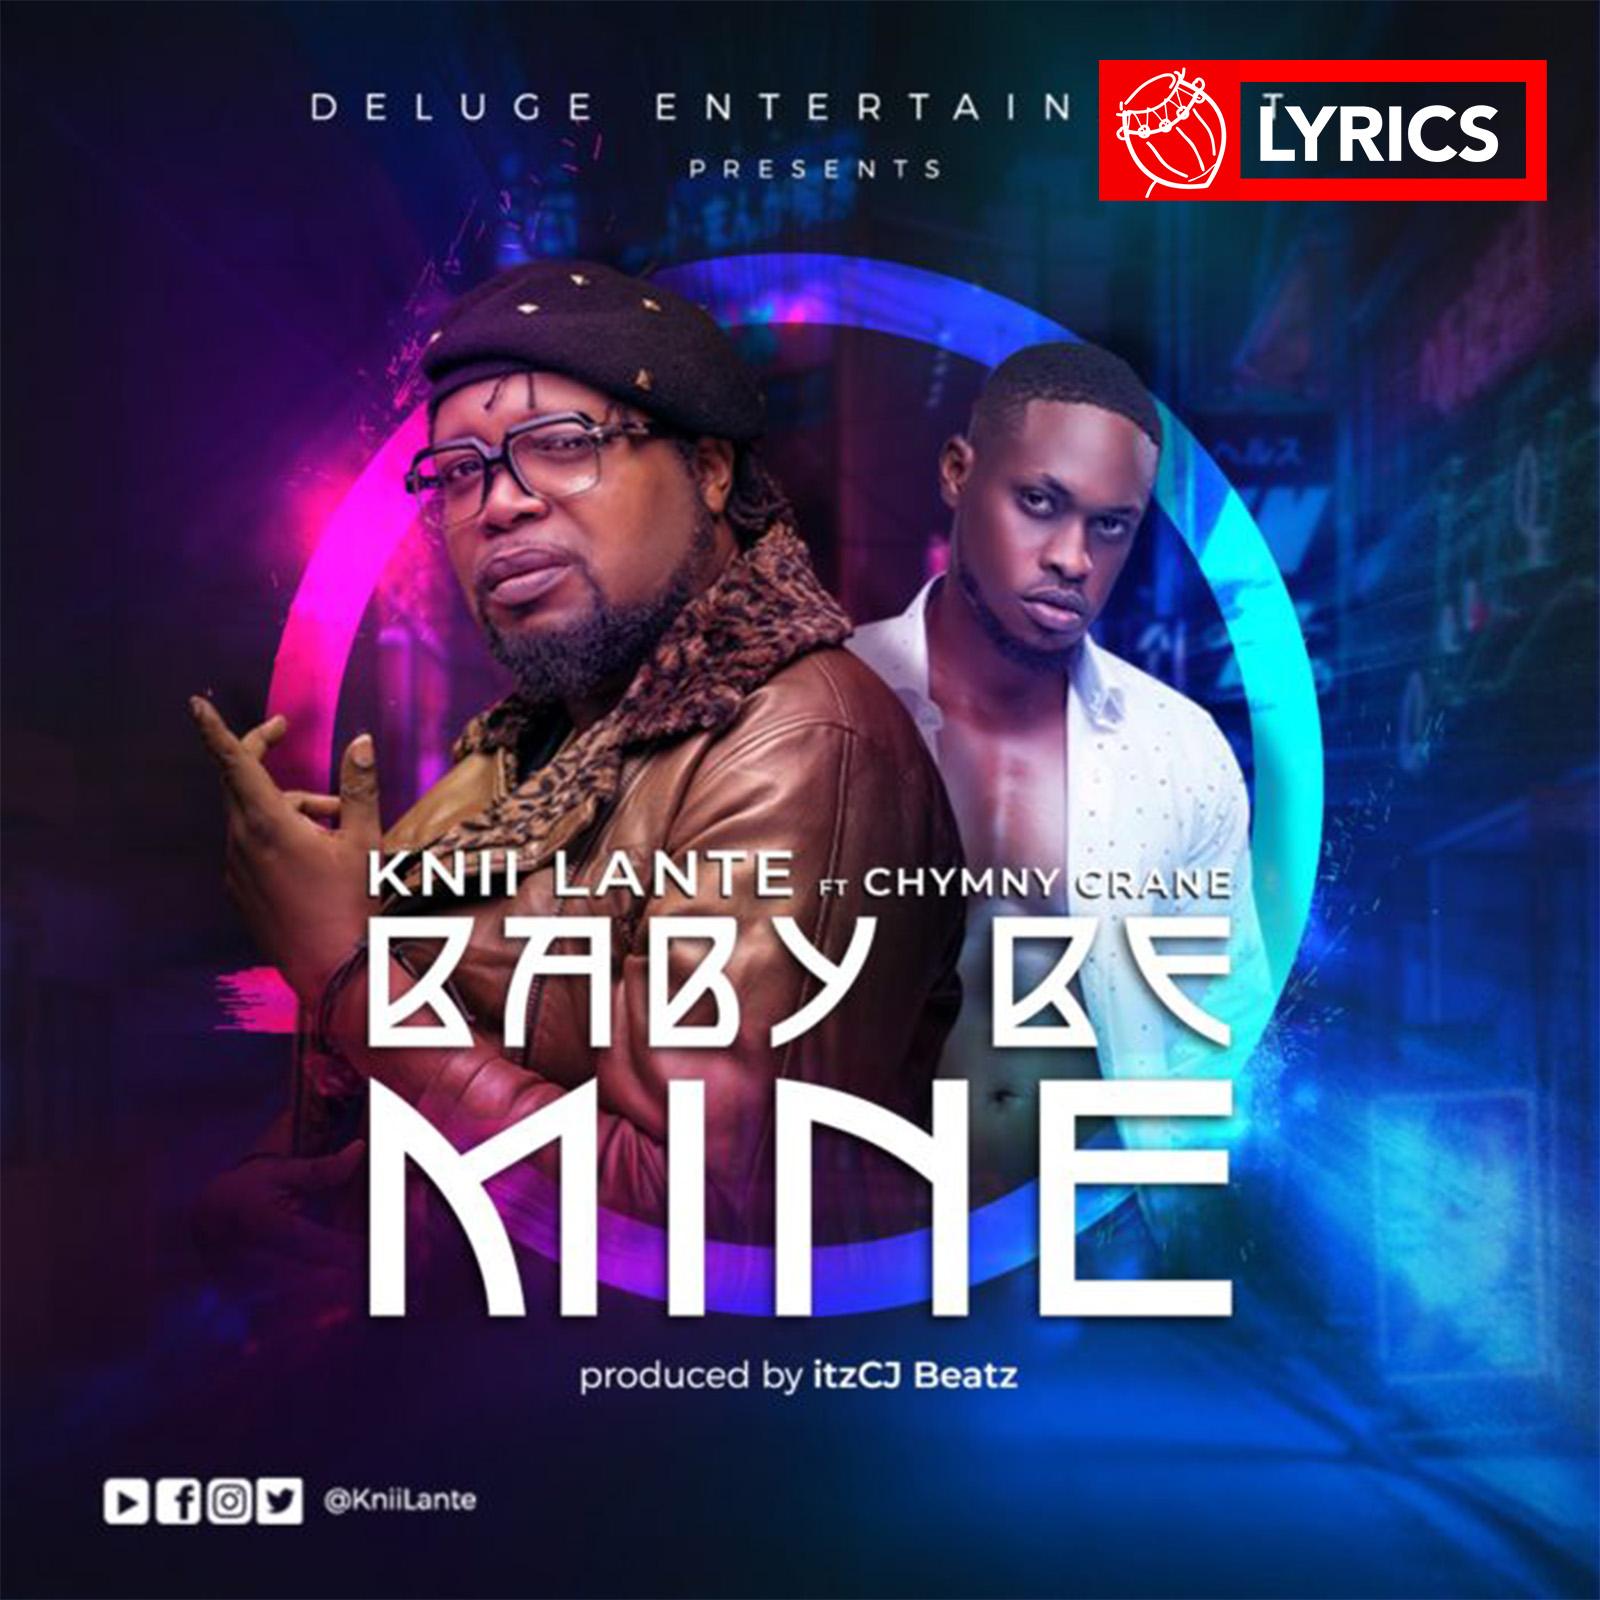 Lyrics: Baby Be Mine by Knii Lante feat. Chymny Crane